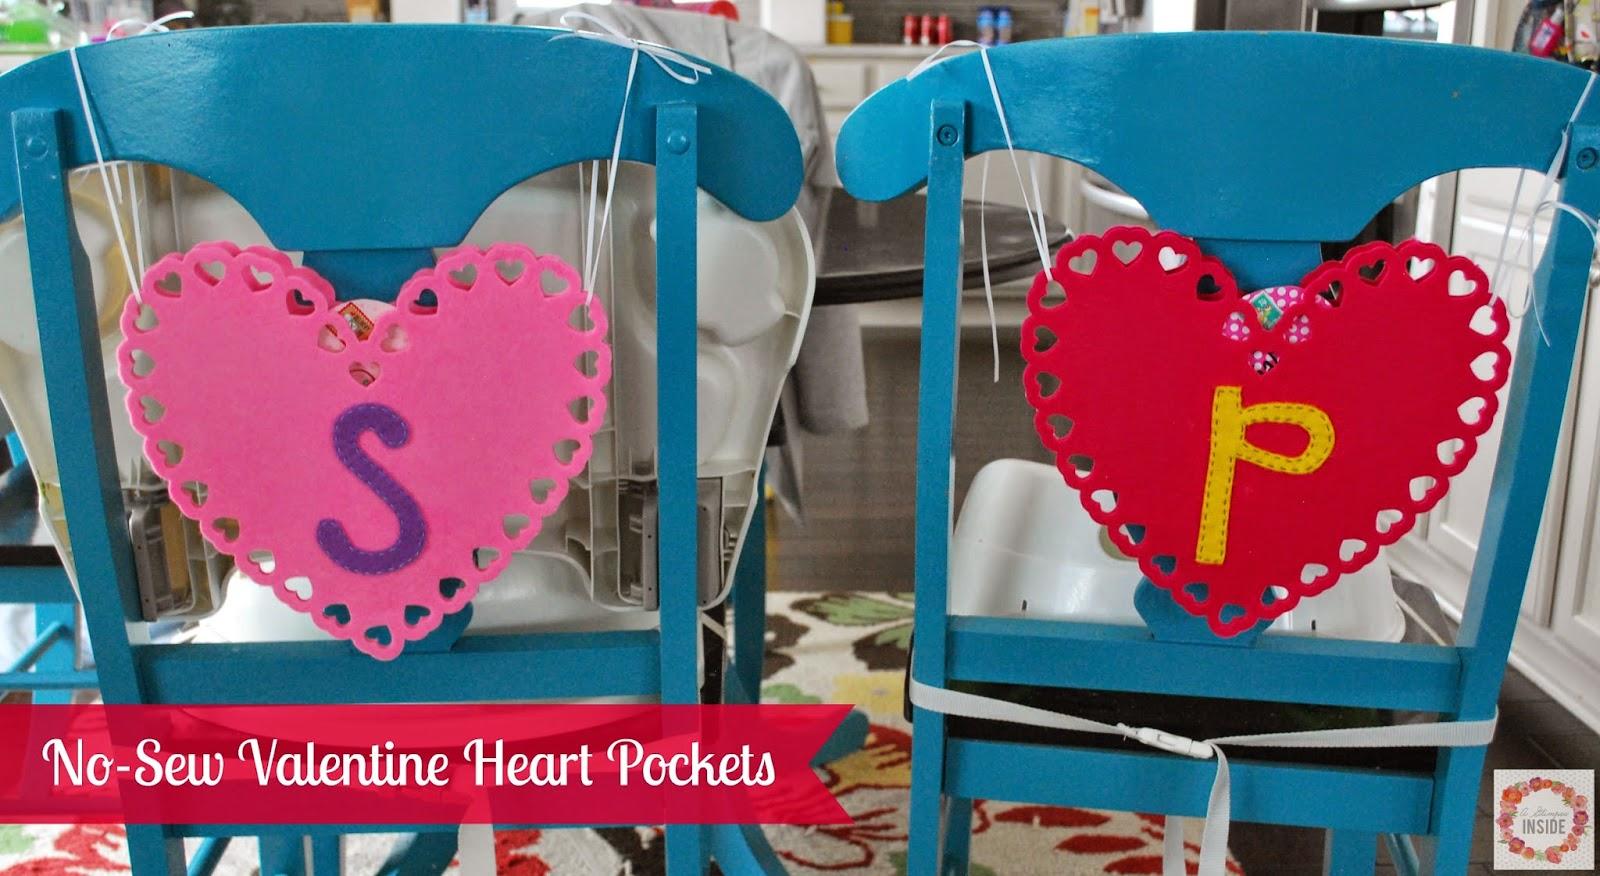 http://www.aglimpseinsideblog.com/2015/02/no-sew-valentine-heart-pockets.html